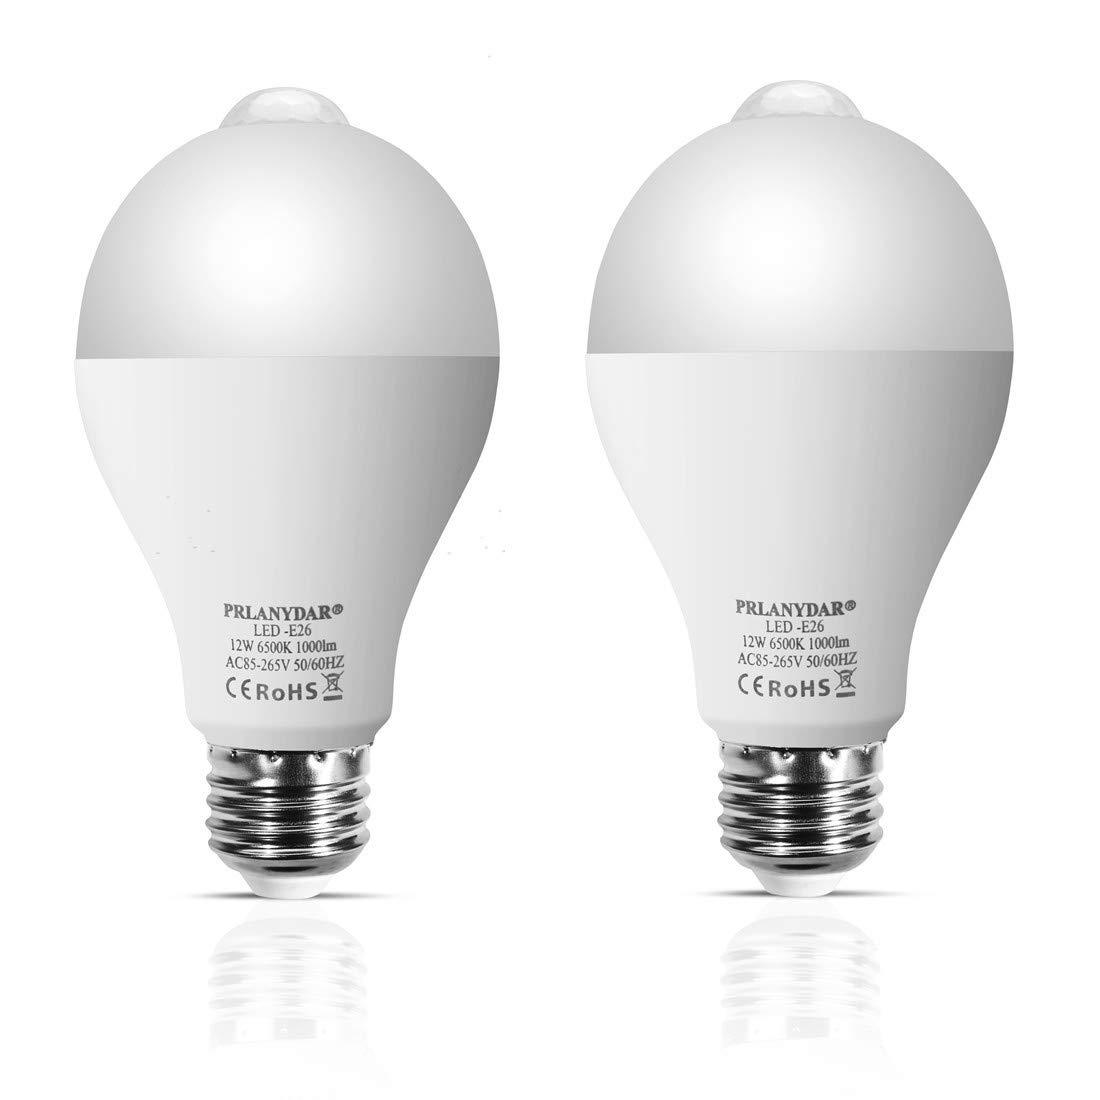 2 Pack Sensitive Sensor Light Bulb 3200K 12W E26 Smart PIR Sensor LED Bulbs 1000LM Automatic LED Light Bulb for Outdoor//Indoor Warm White